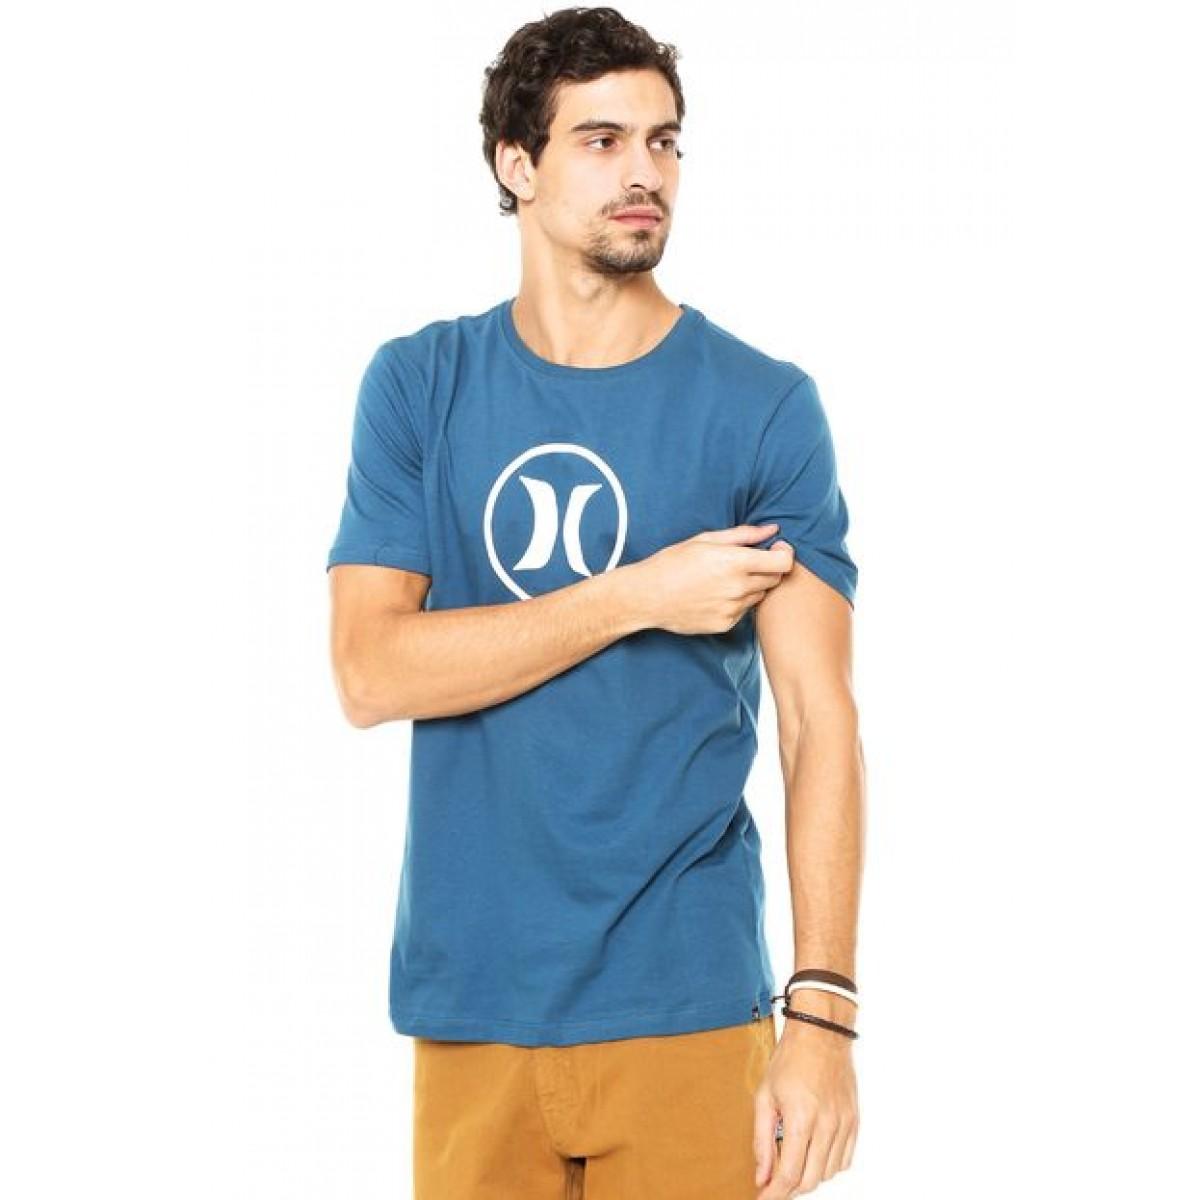 Camiseta Hurley Circle Icon Masculina - Azul